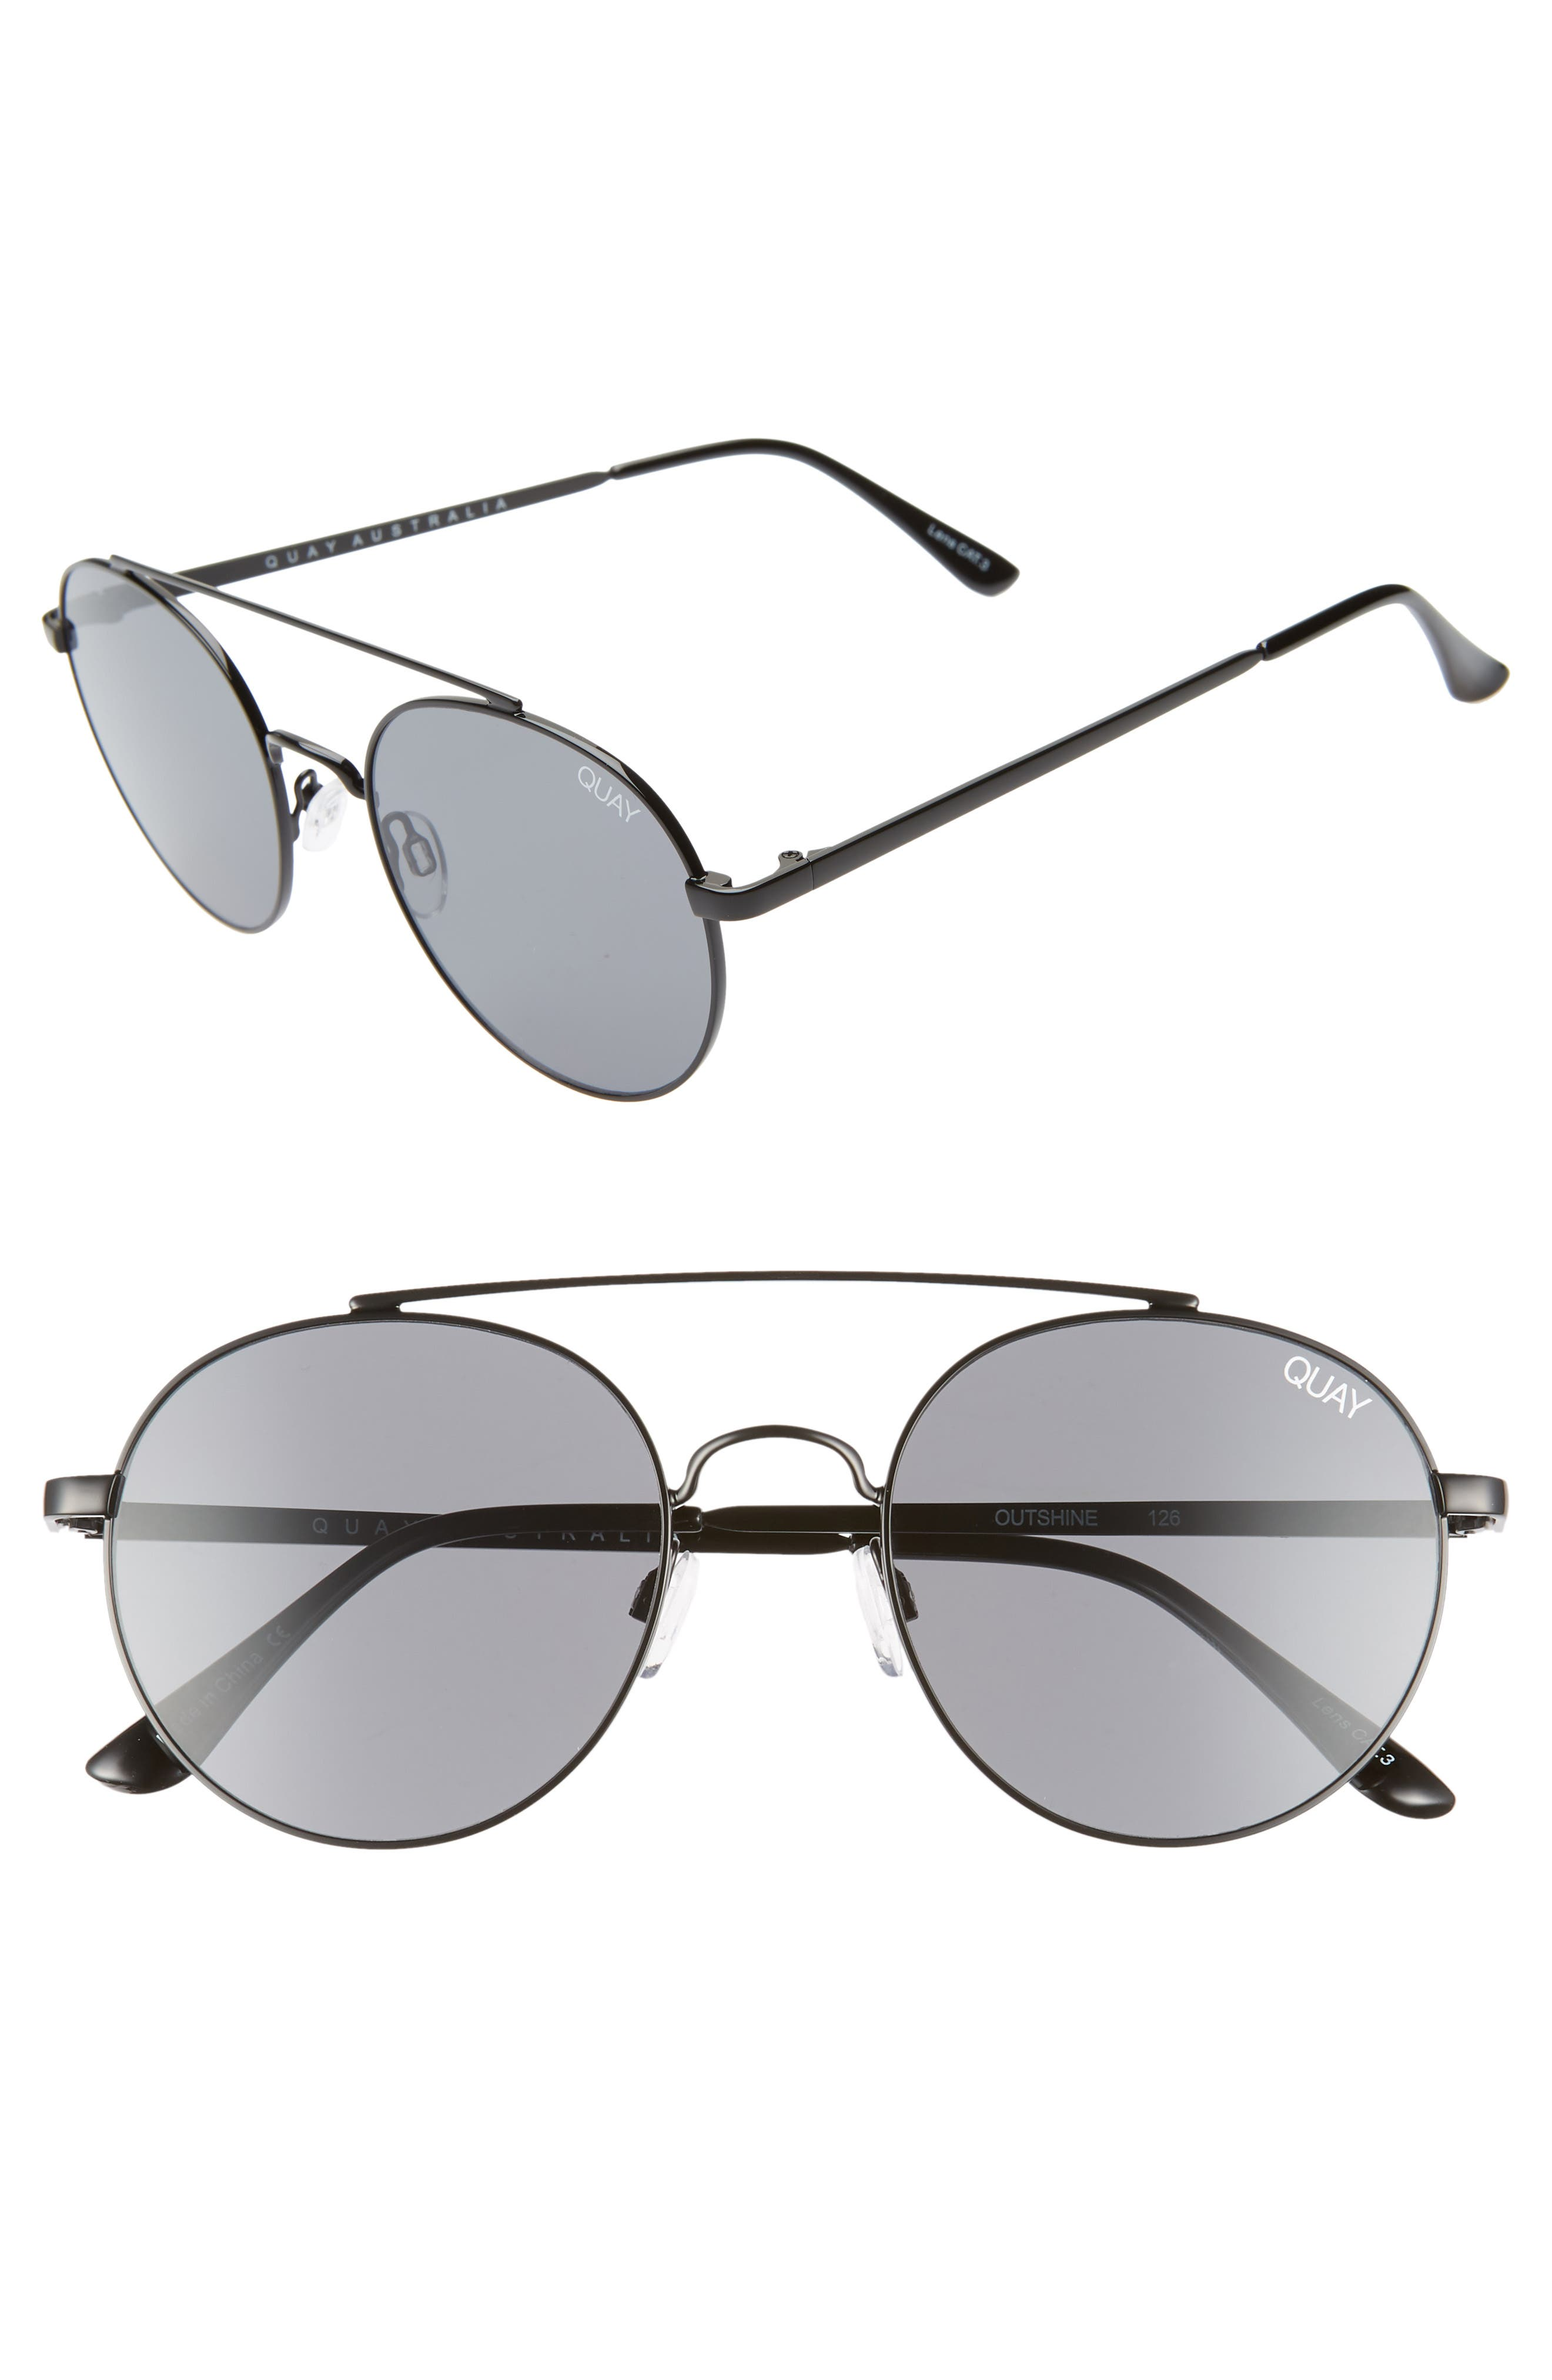 Quay Australia Outshine 5m Round Sunglasses - Black / Smoke